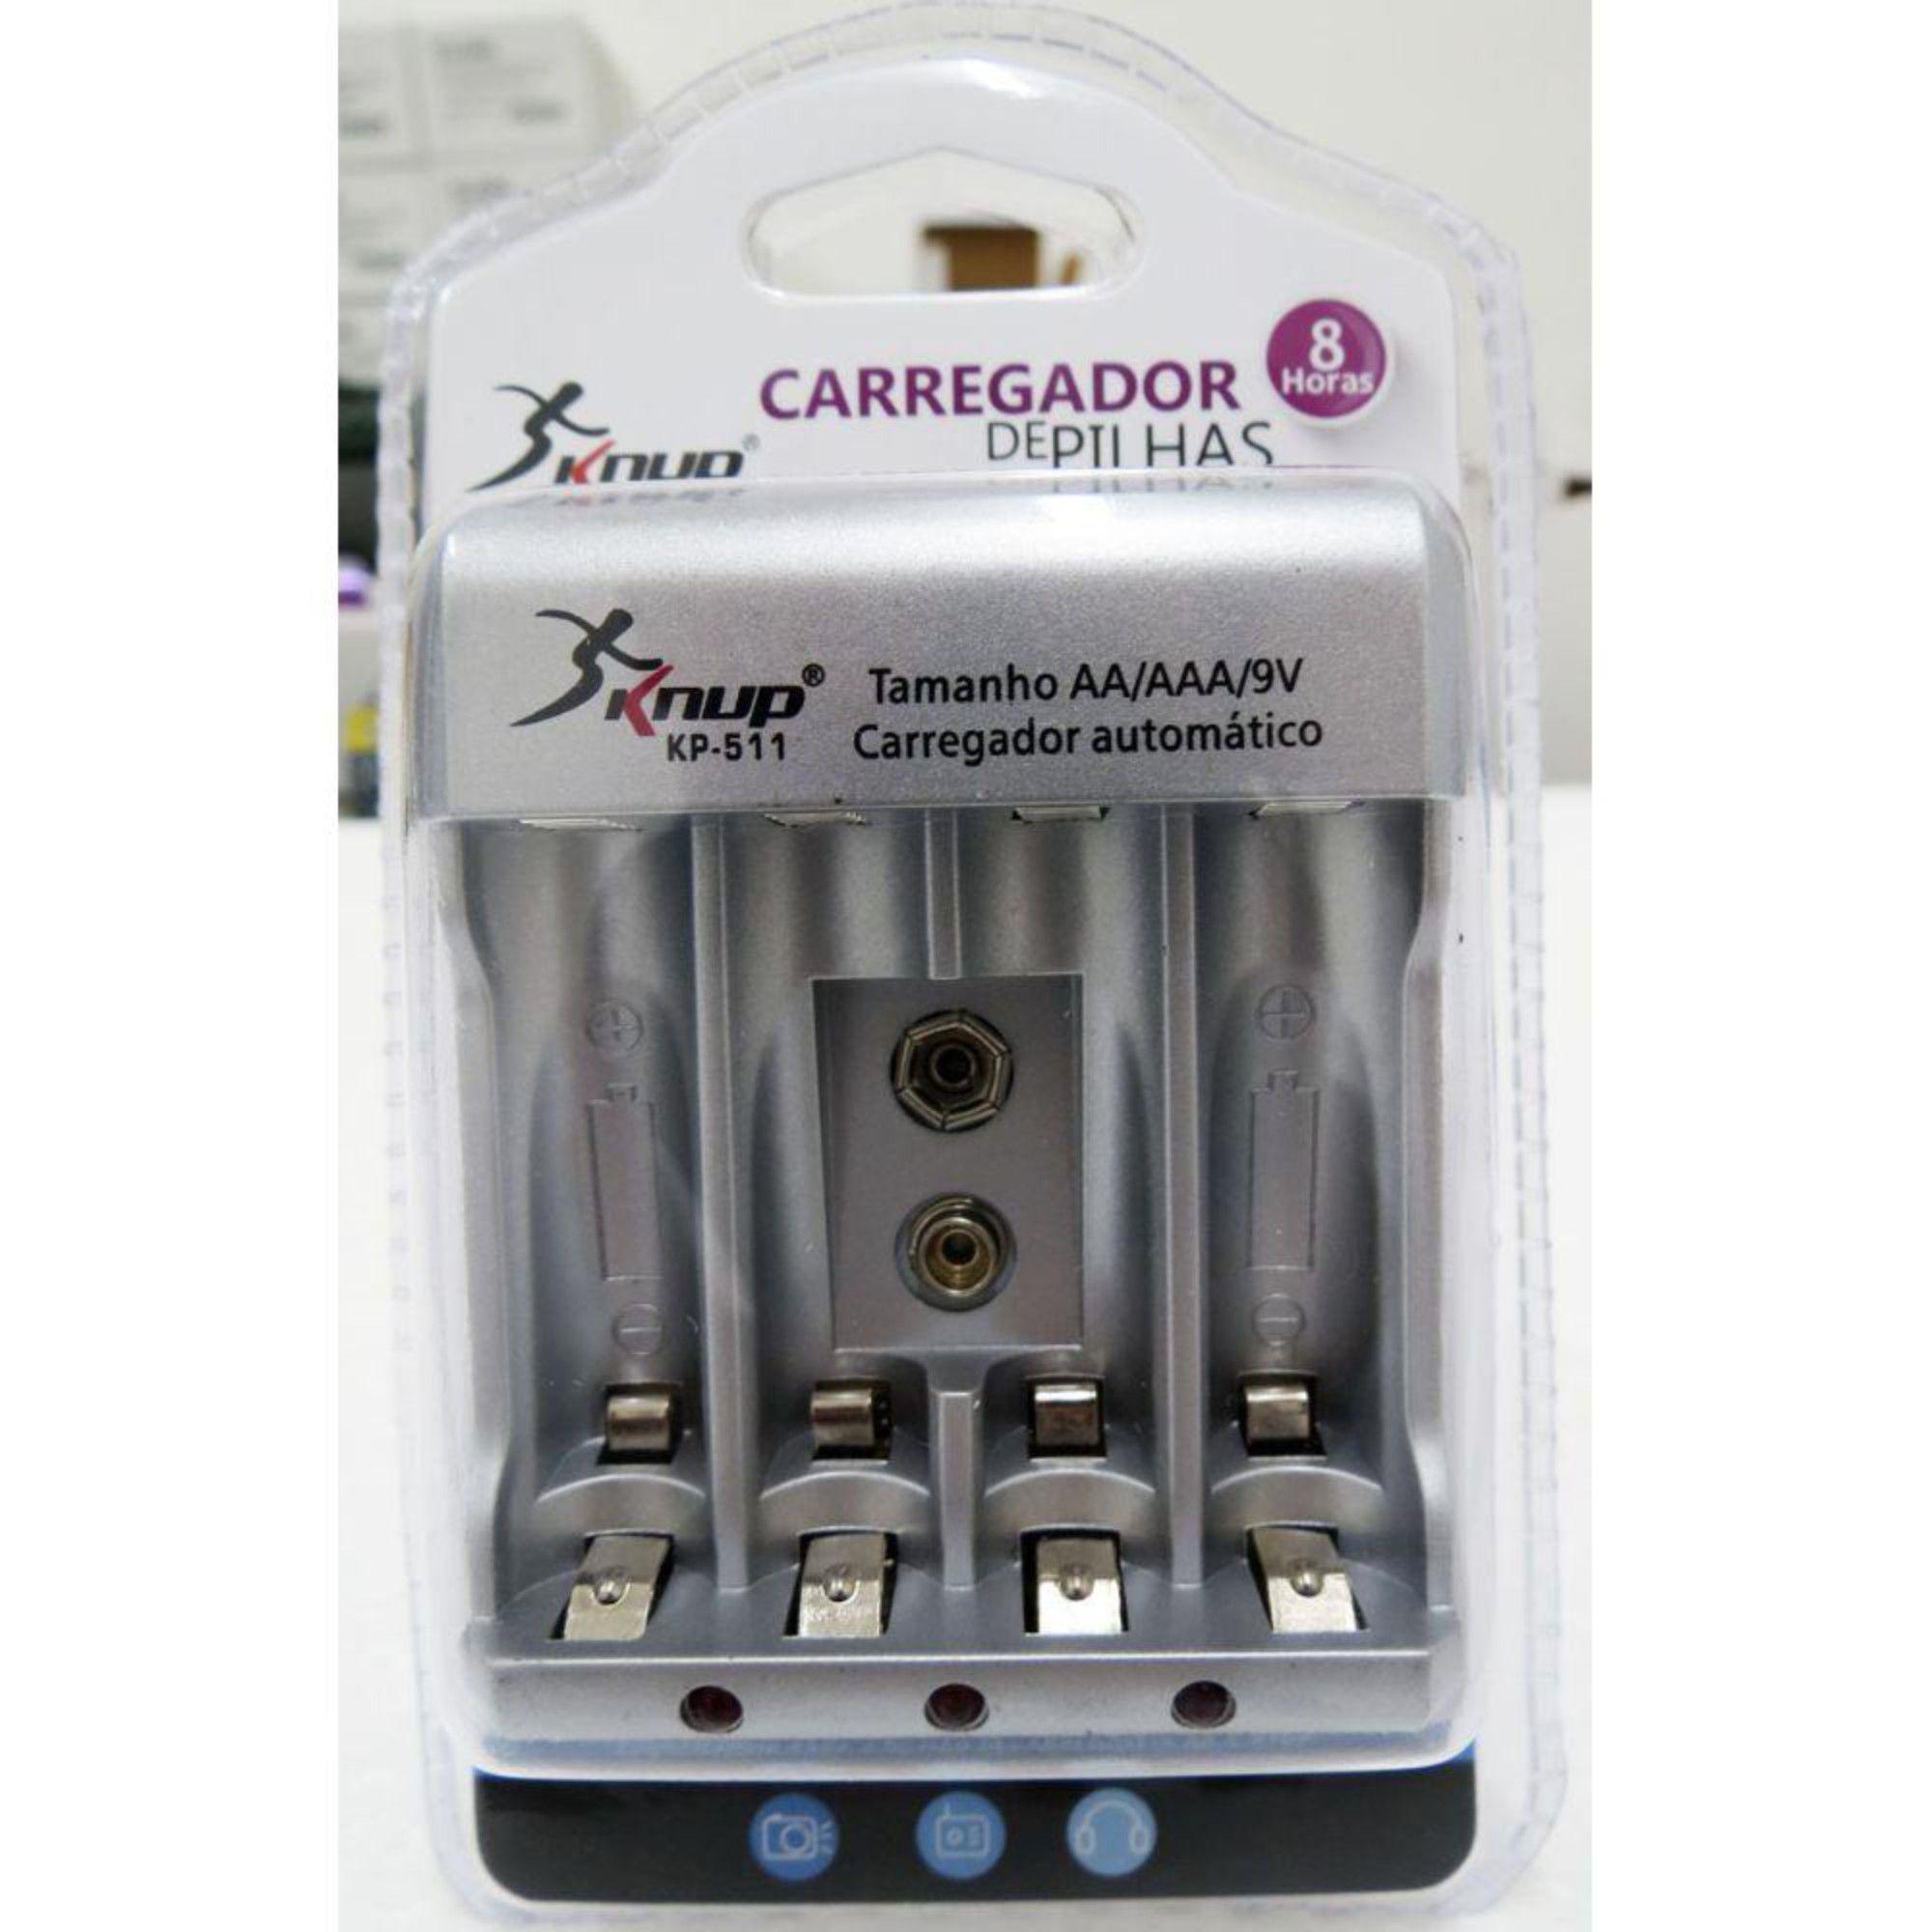 Carregador De Pilha P/ 4 Pilhas AA/AAA E Bateria 9v